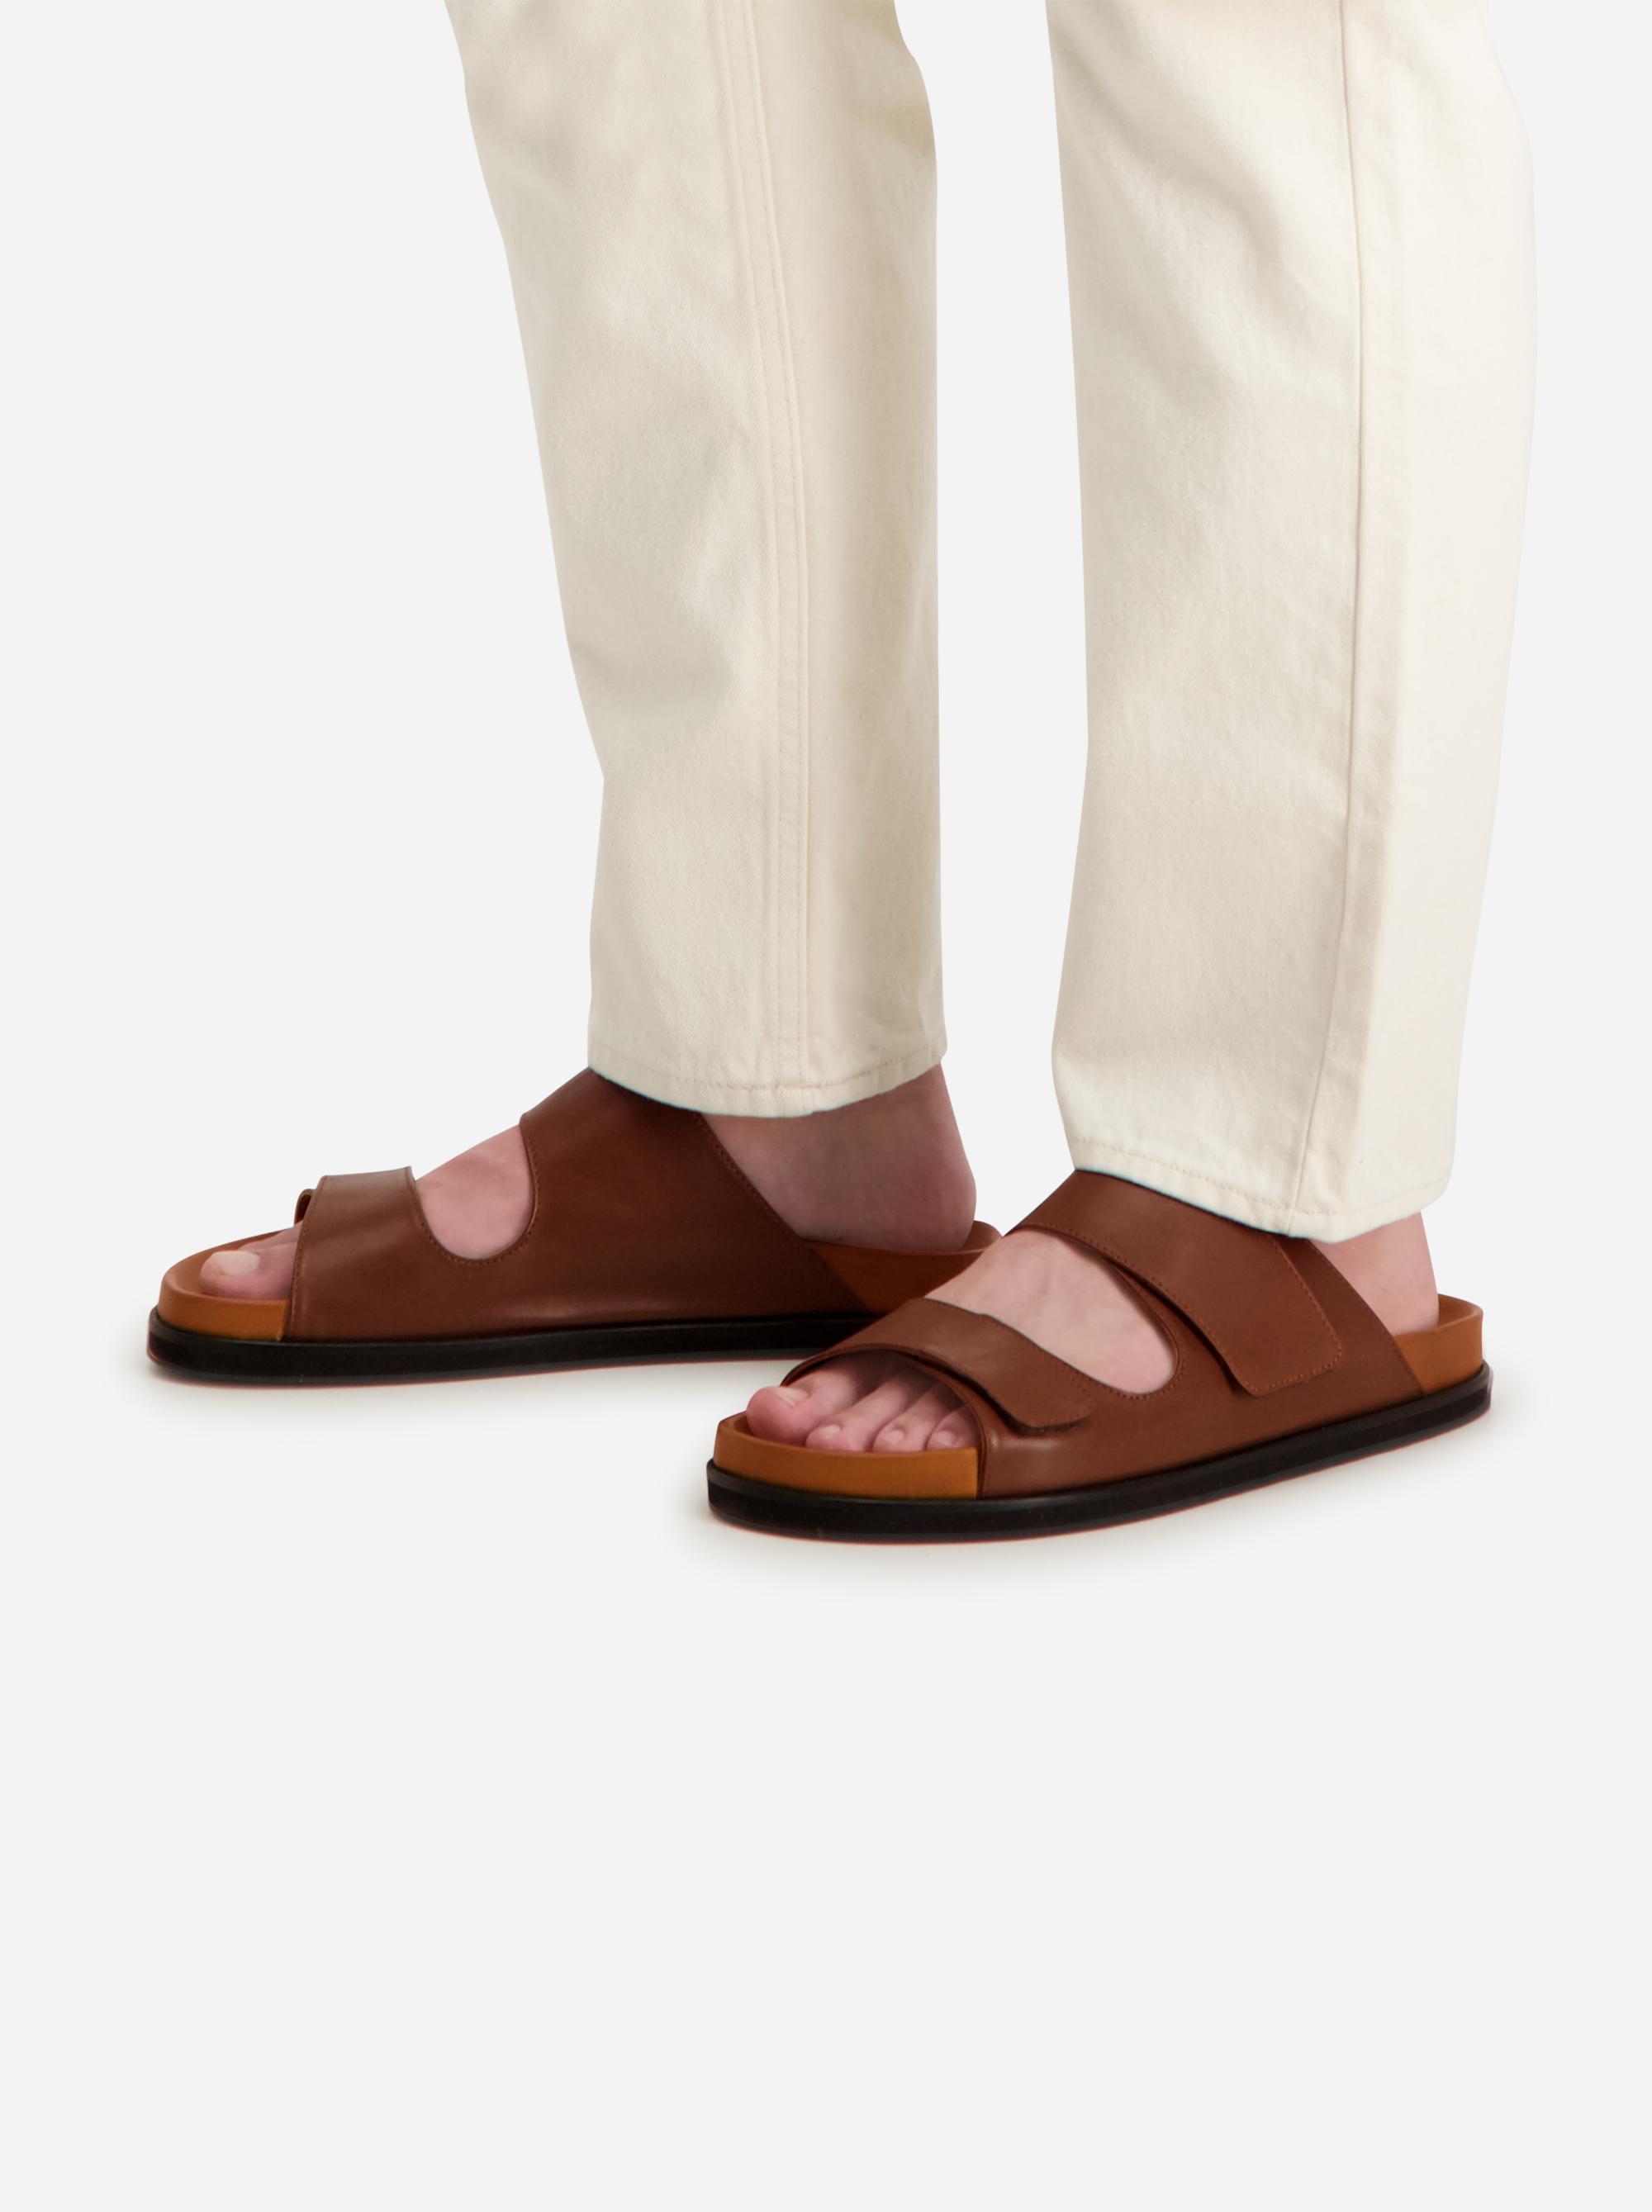 Teym - The Sandal - Men - Brown - 1